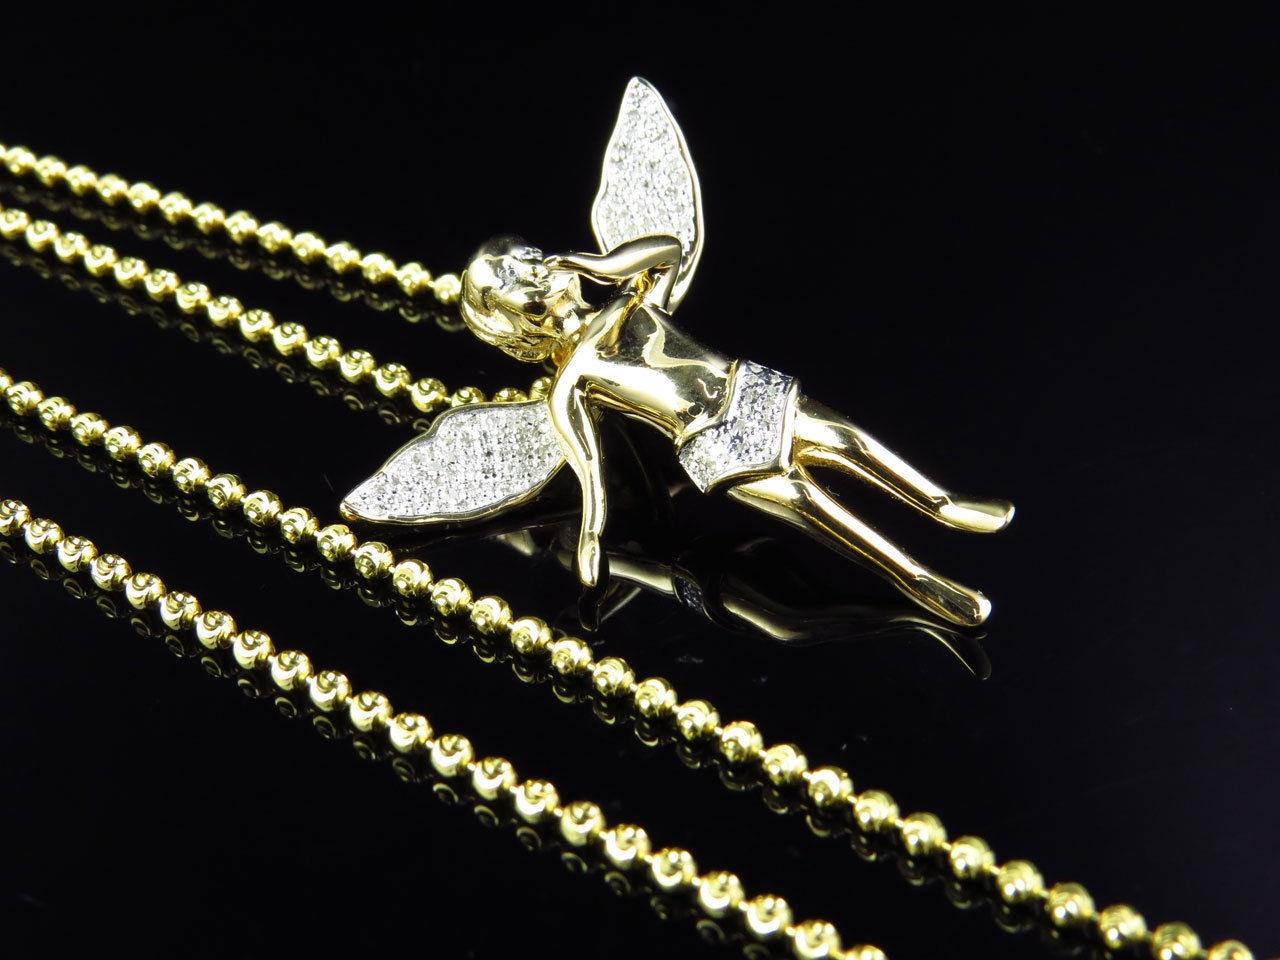 Yellow gold finish real diamond 3d angel pendant charm 50 ct with yellow gold finish real diamond 3d angel pendant charm 50 ct with moon chain aloadofball Gallery